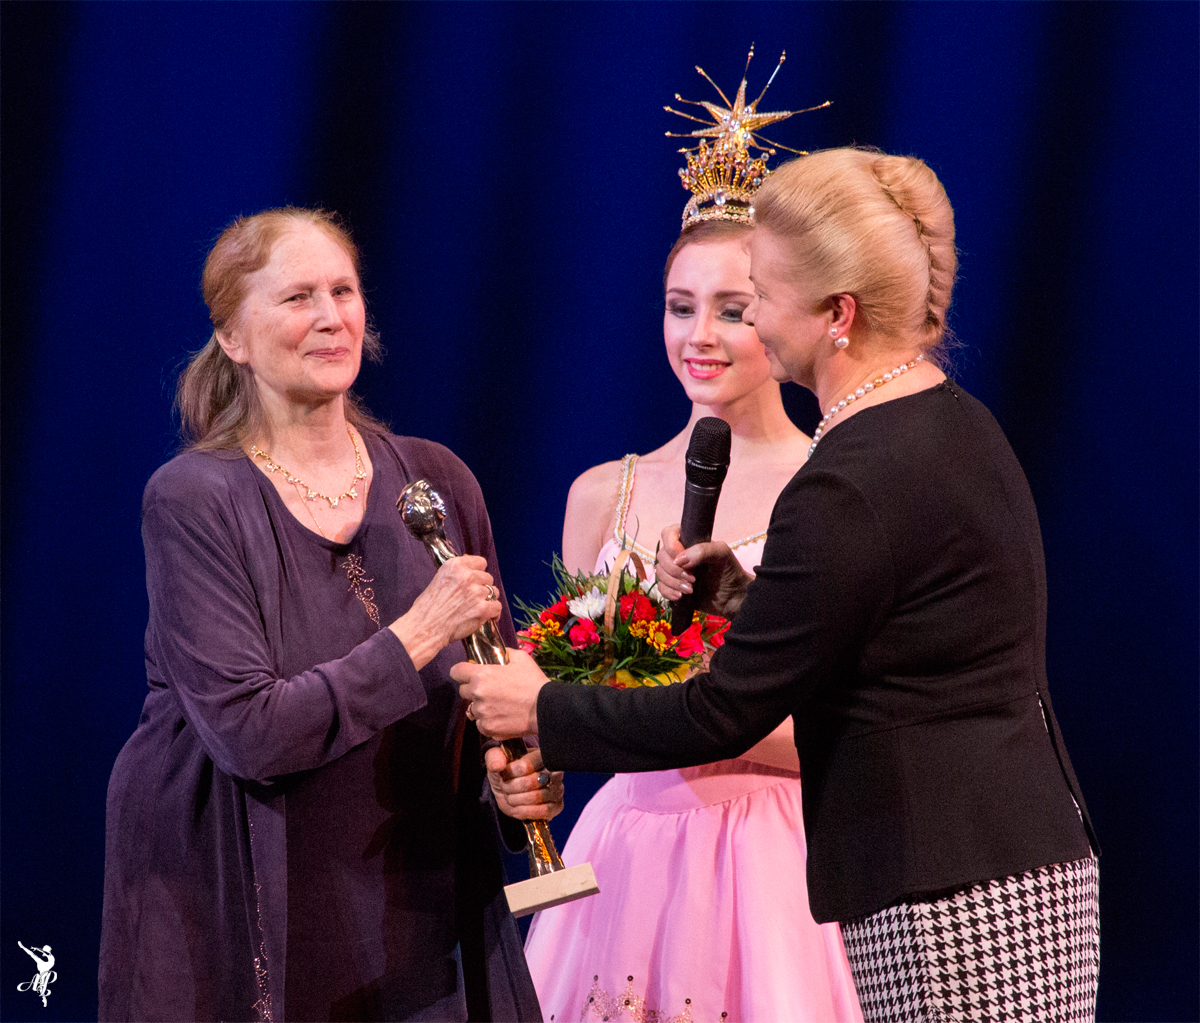 http://vaganovaacademy.ru/vaganova/news/photo/Душа%20танца%202015/Т.Удаленкова_Душа_танца_Академия_балета_1.jpg